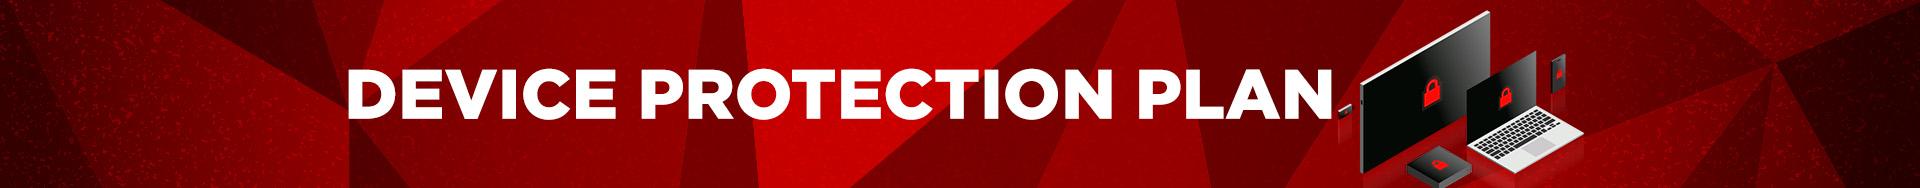 Device Protection Plan, JackysElectronics.com